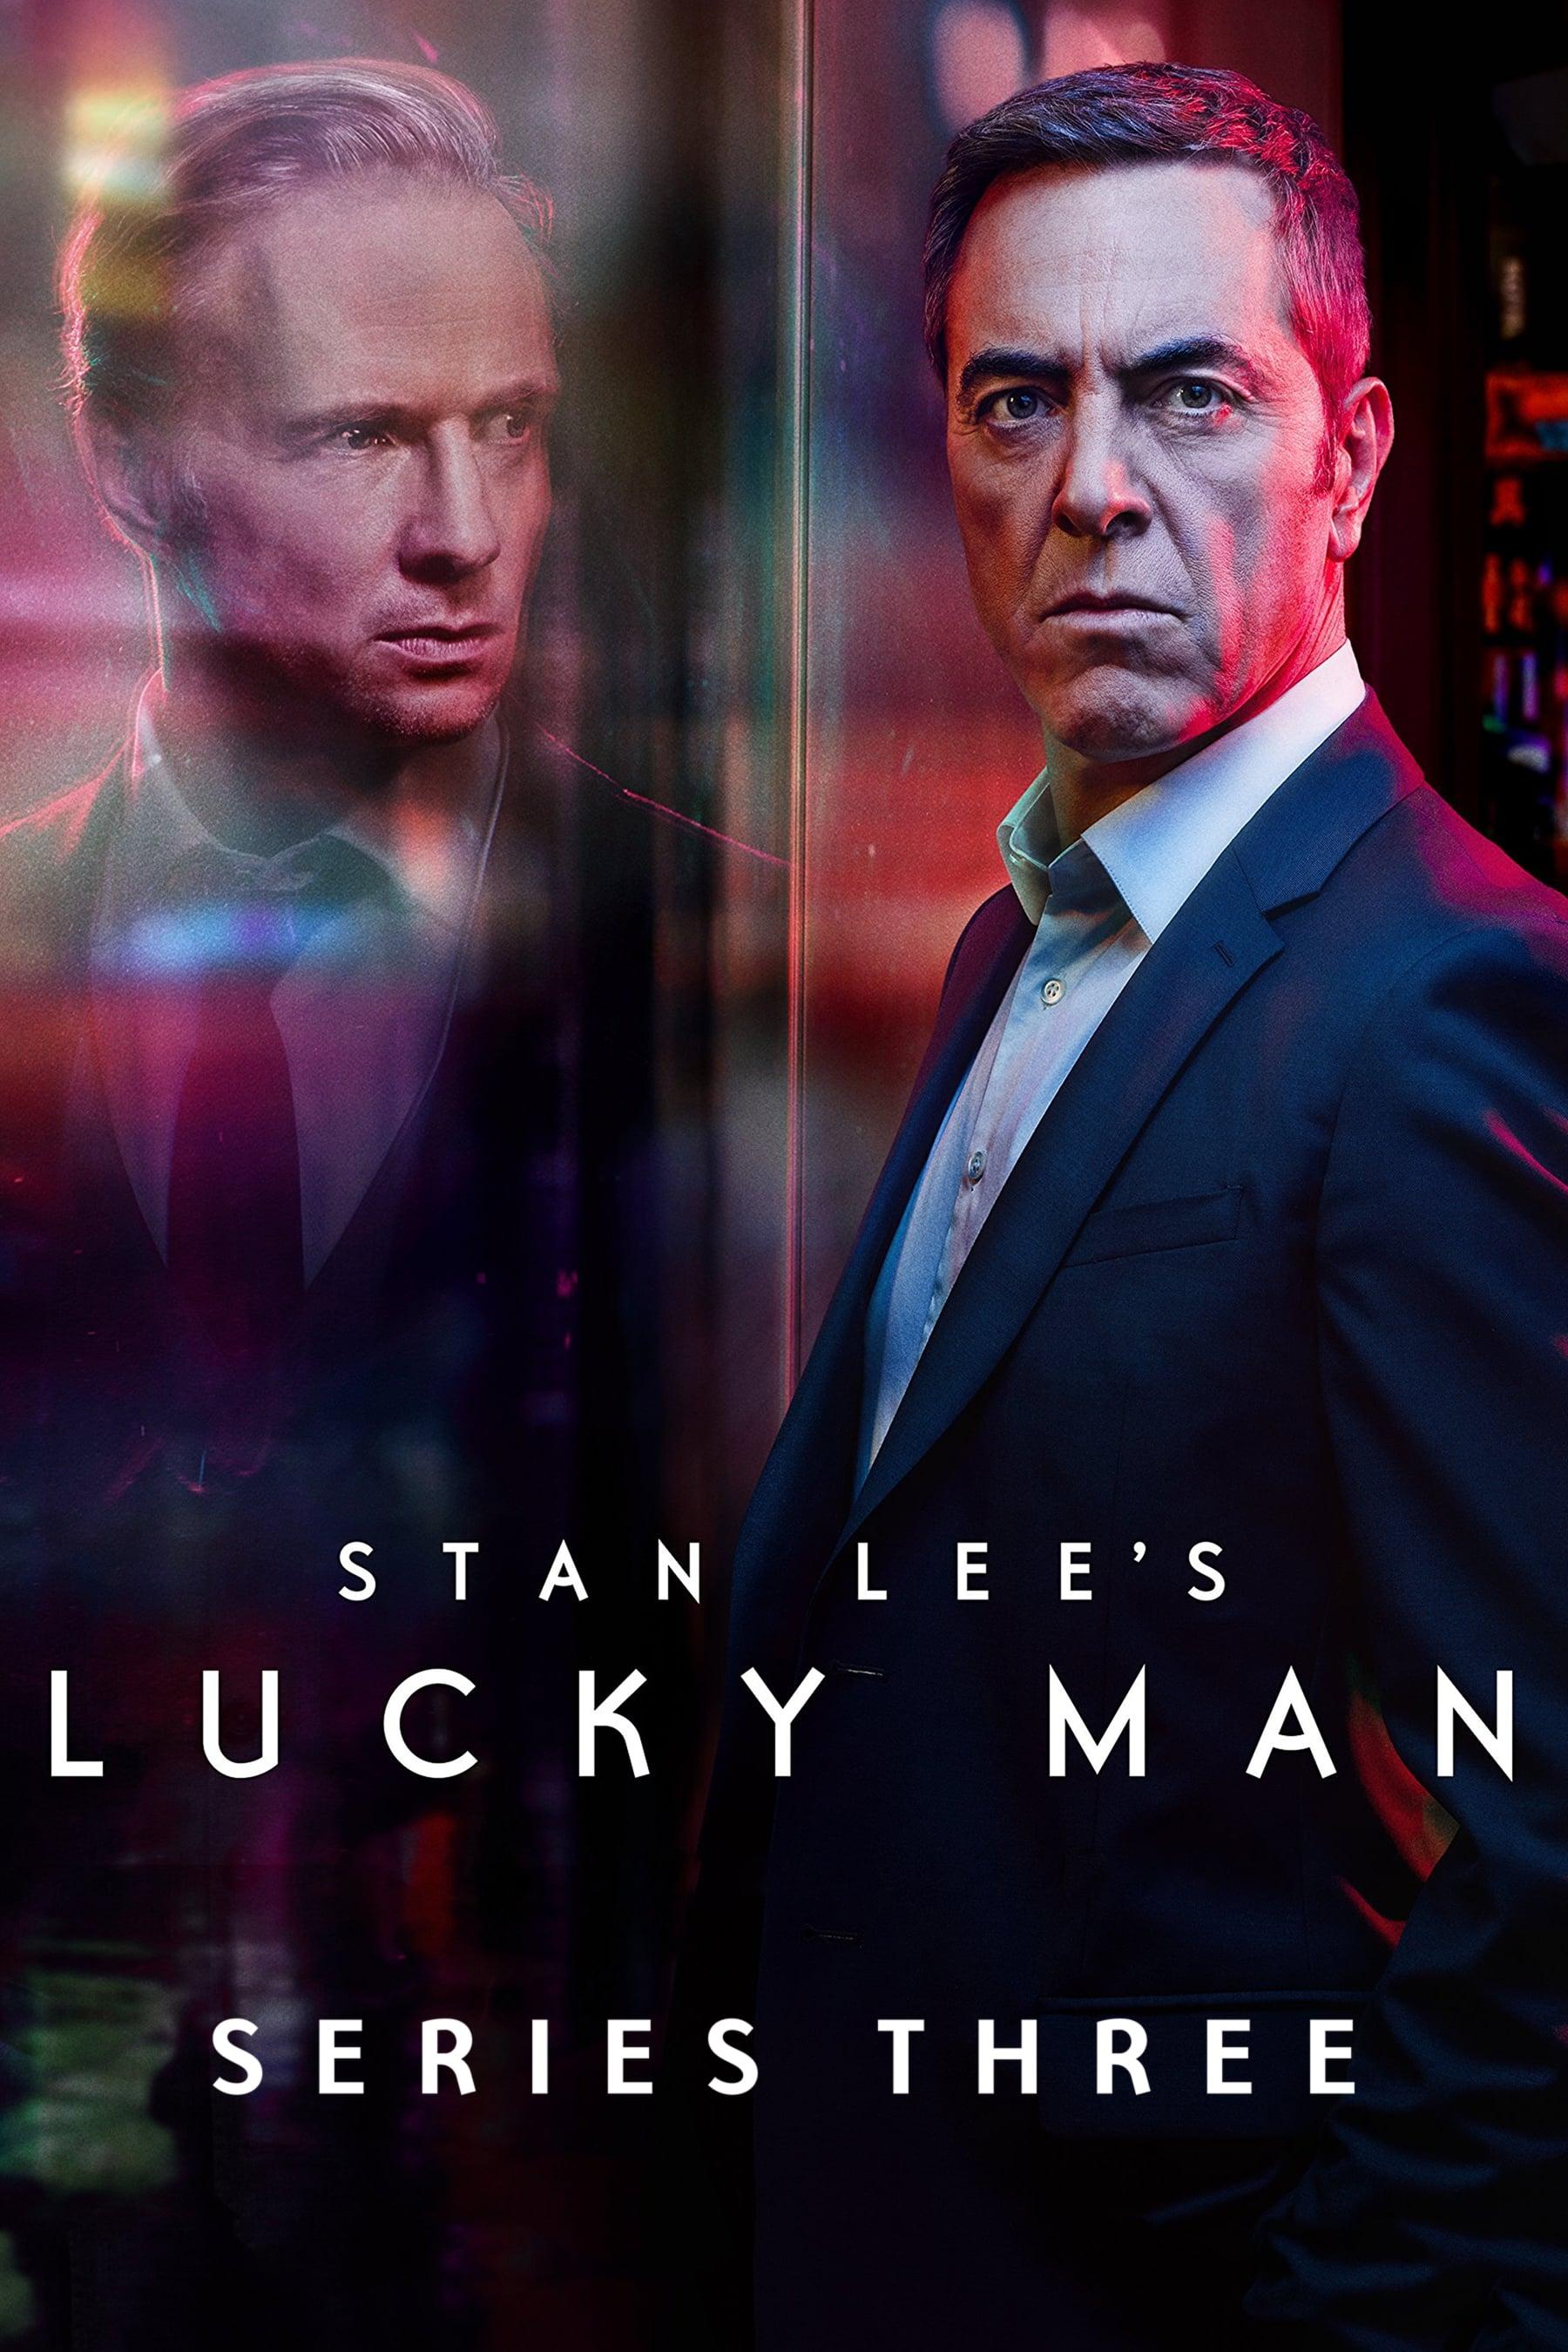 Stan Lee's Lucky Man Season 3